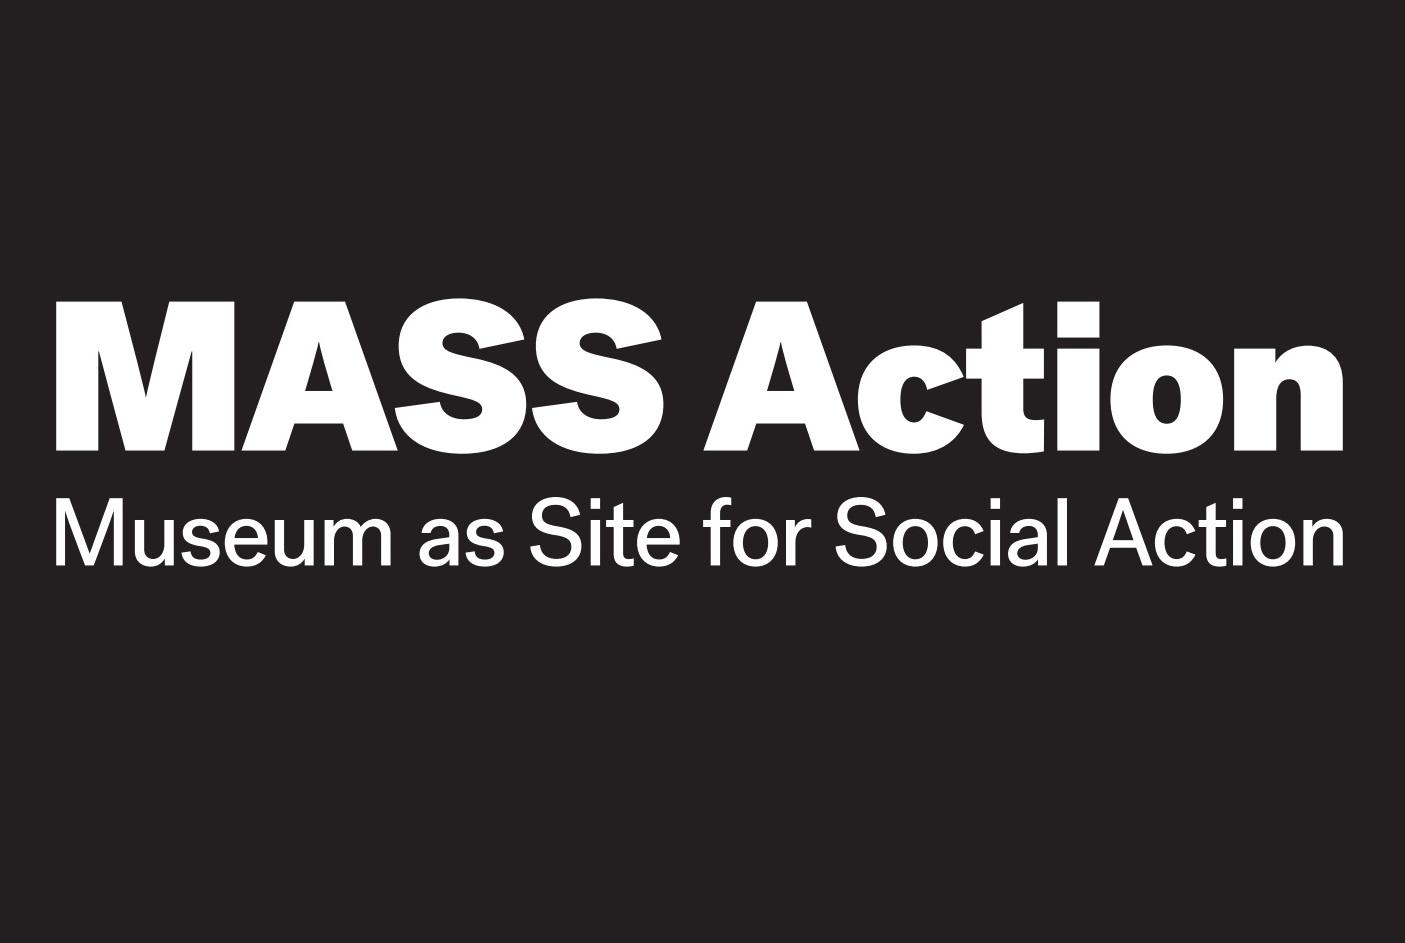 CoSponsor MASS Action logo - Elisabeth Callihan